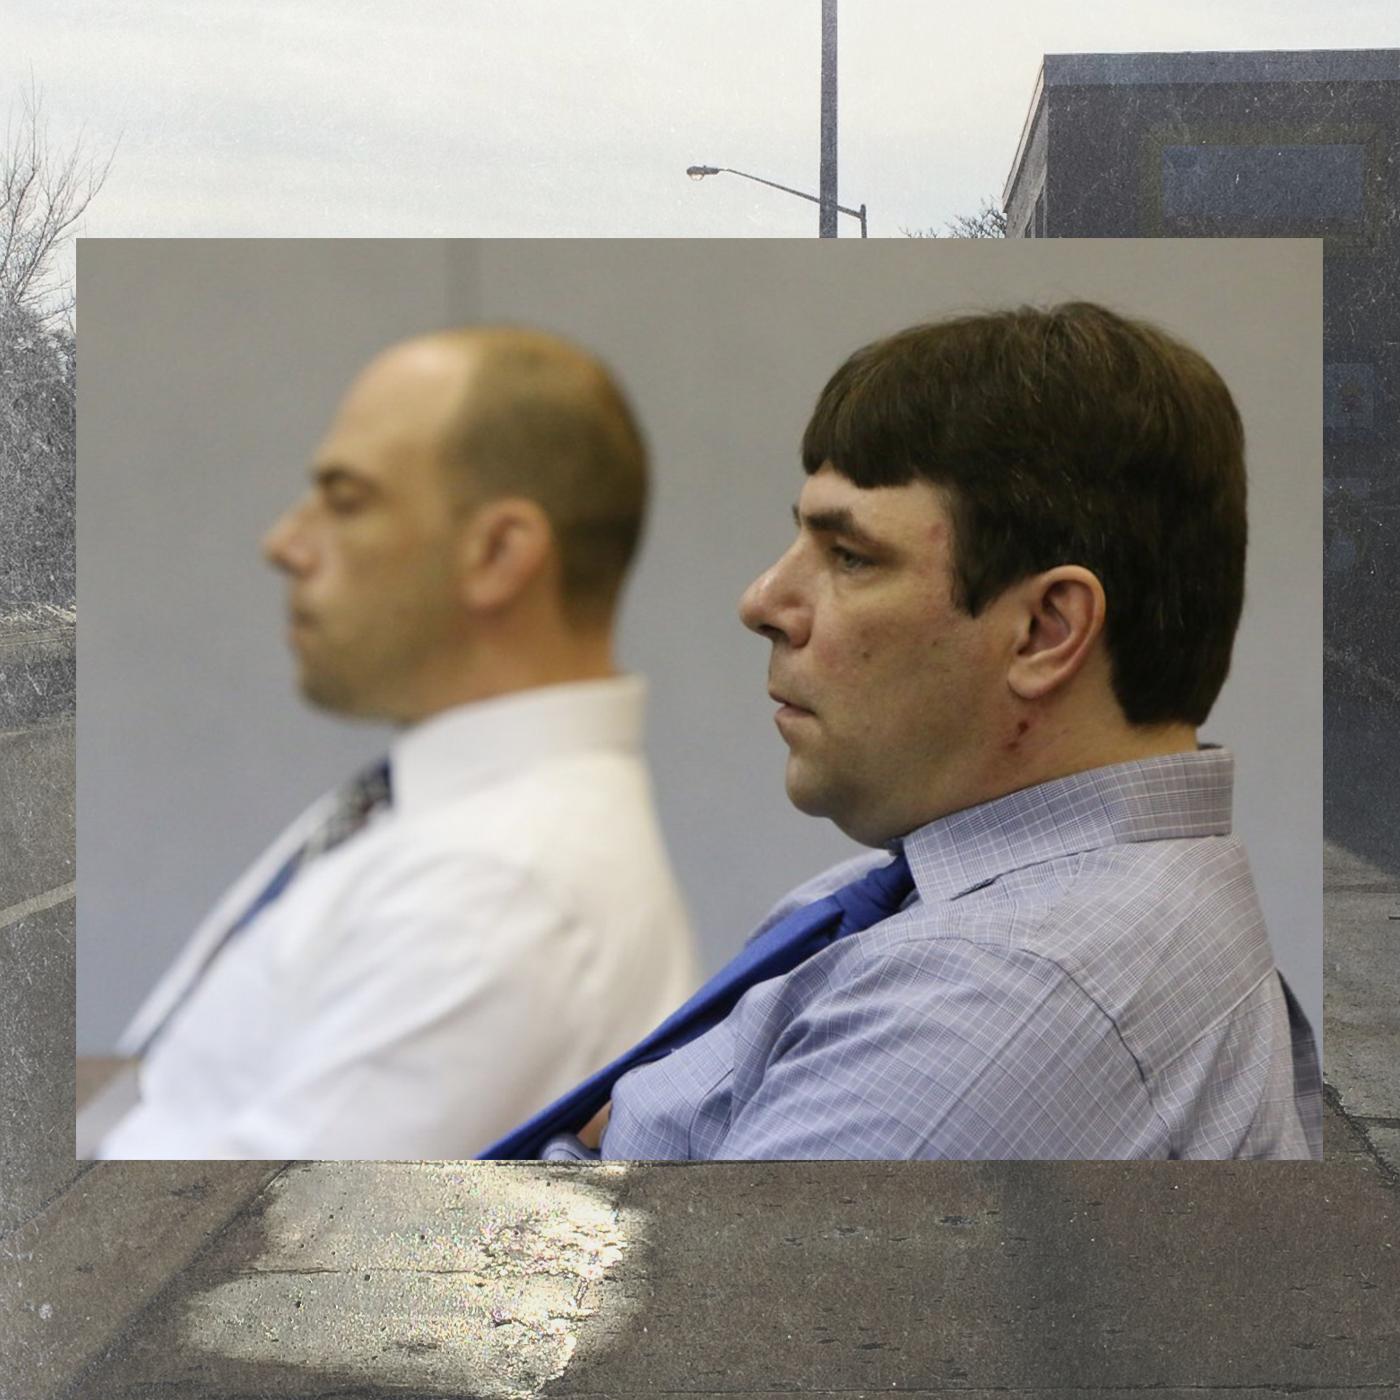 Paul and Matthew Jones at their preliminary examination